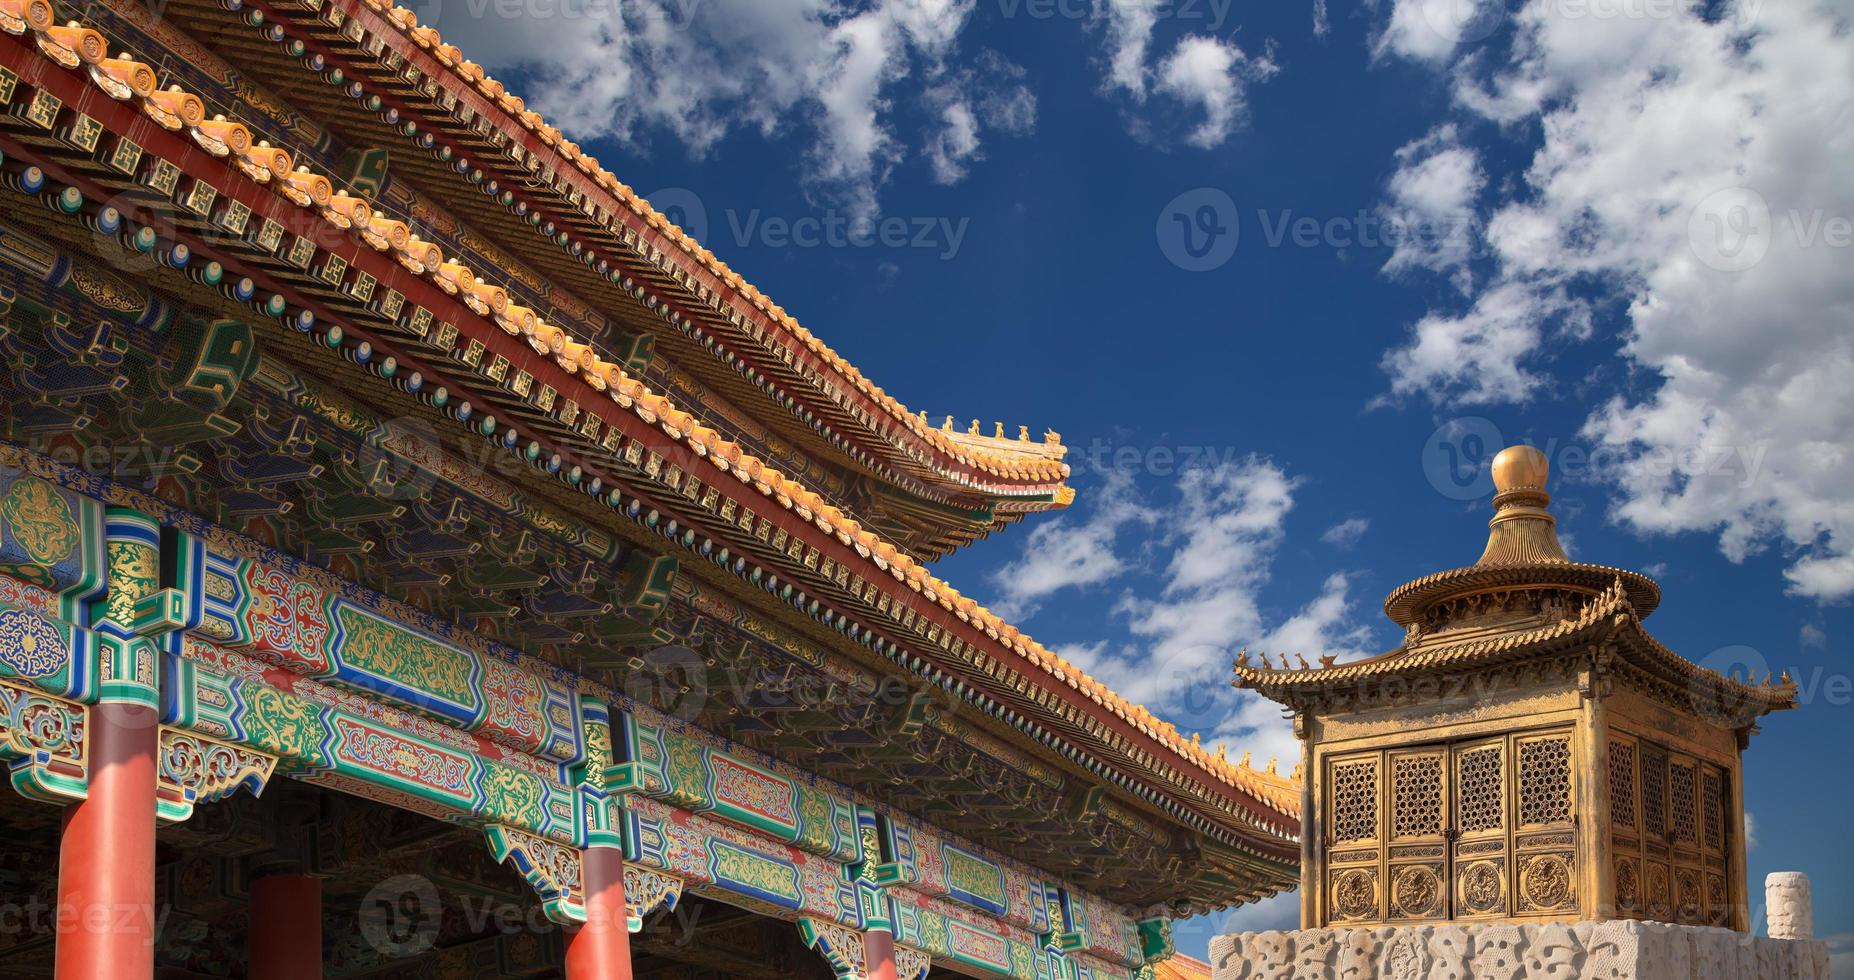 cidade proibida, beijing, china foto